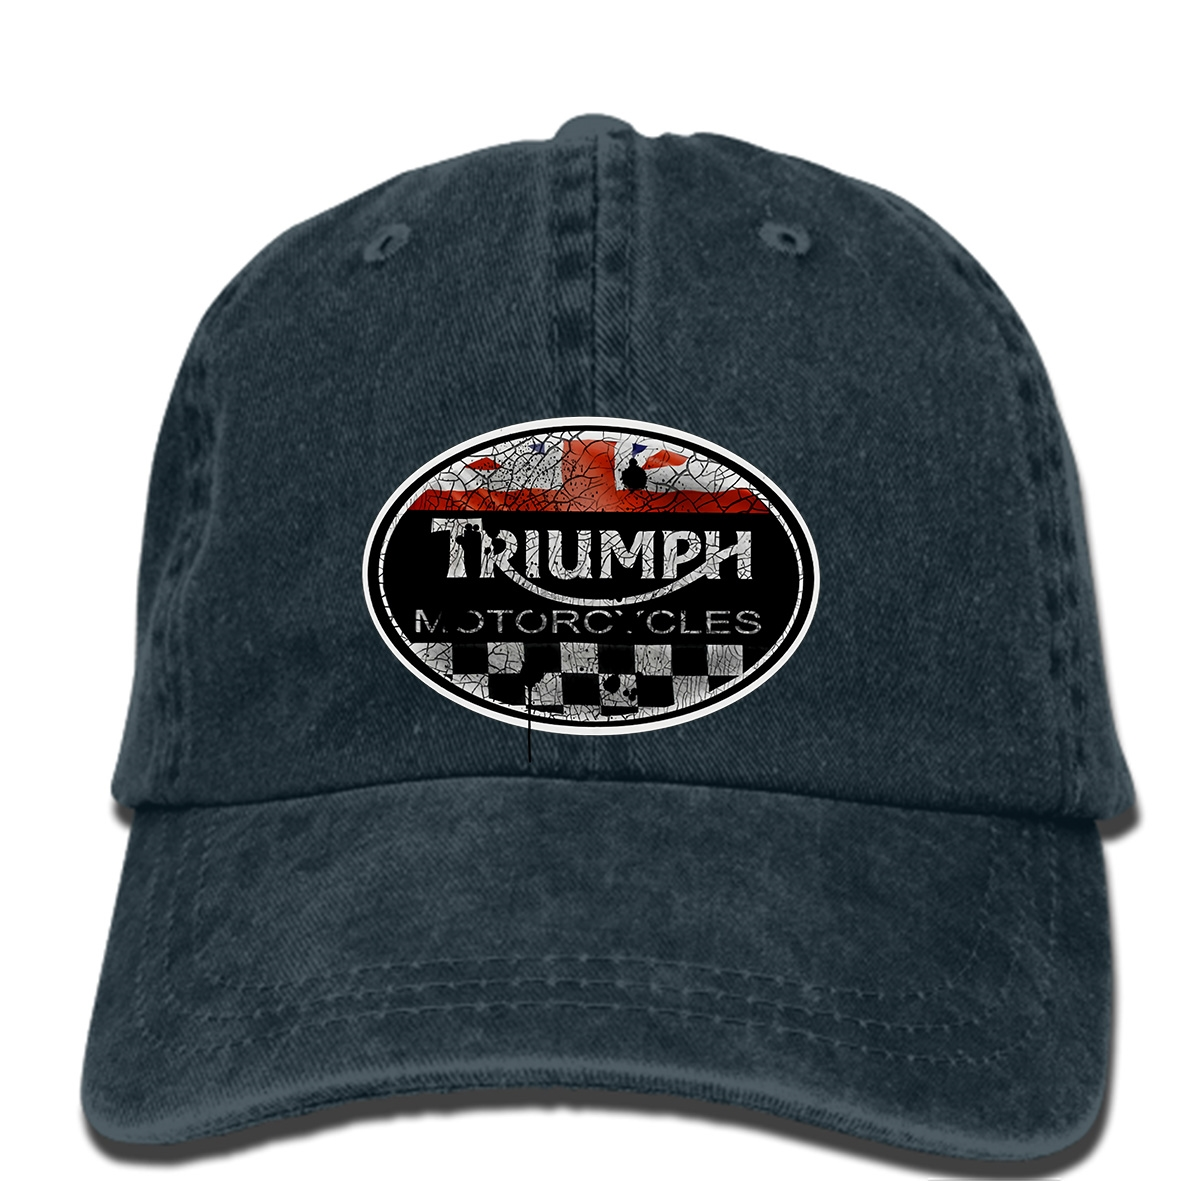 Strapback Cap Its Labor Day Weekend Lets Celebrate Adjustable Designer Ball Truckers for Women//Men